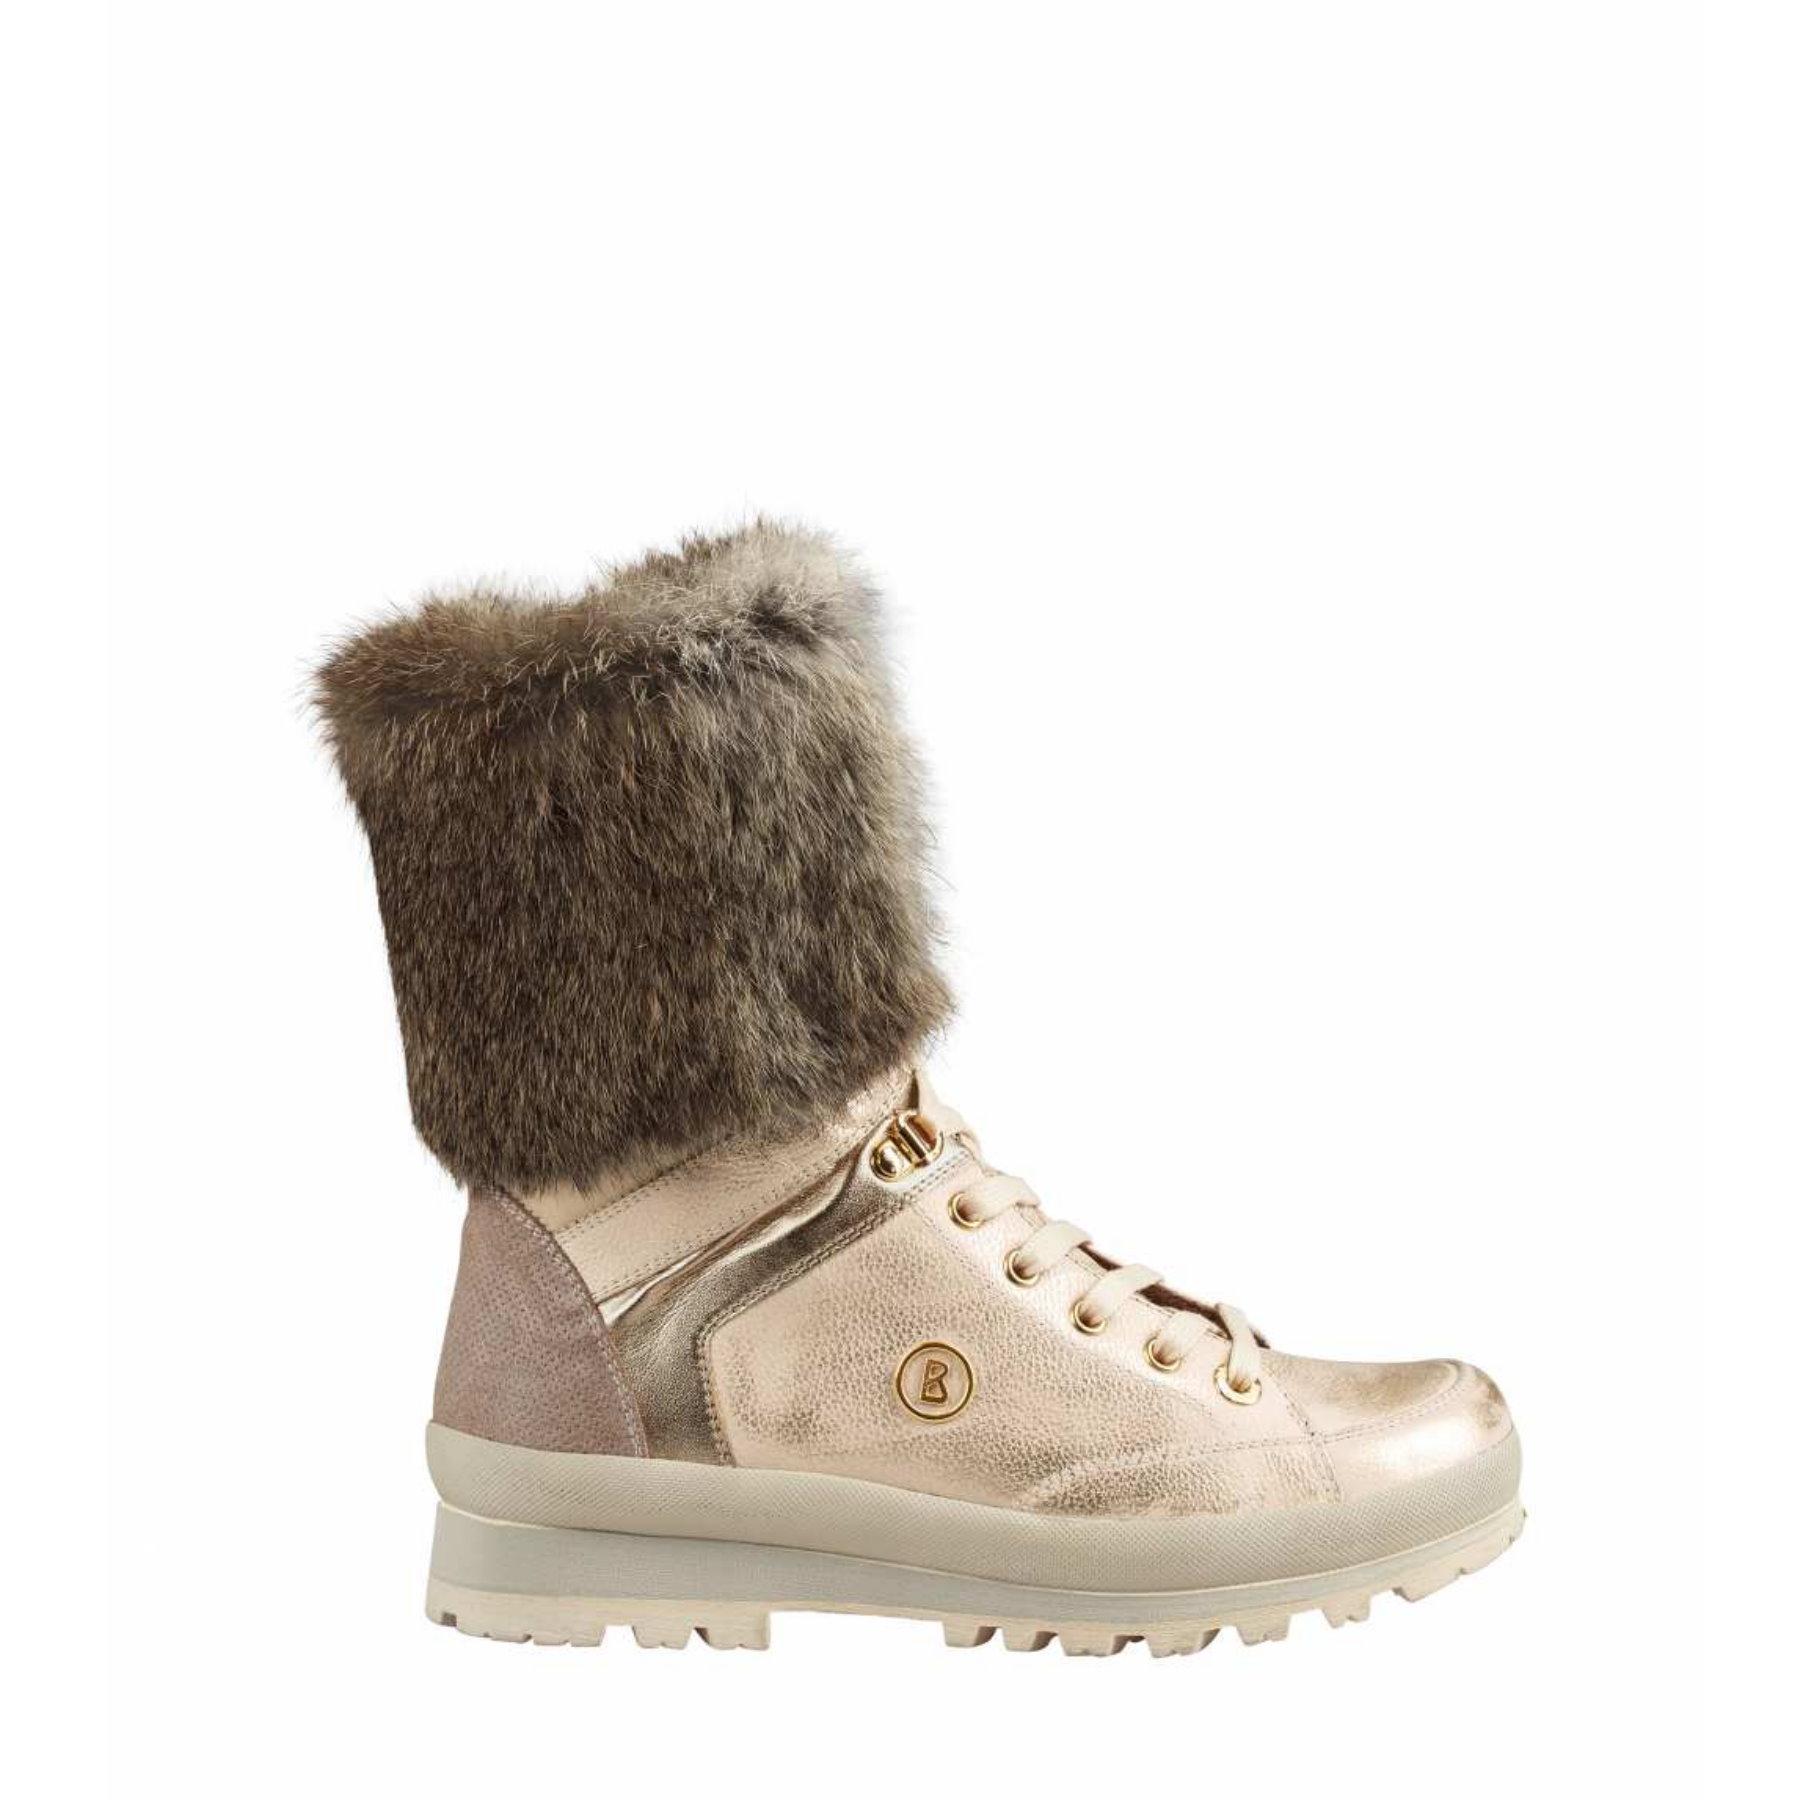 watch f3444 64184 BOGNER Damen Stiefel/Schuhe St. Anton L3 N-53, Size: 35 EU - to - 39 EU /  Platinum | Fashion-House